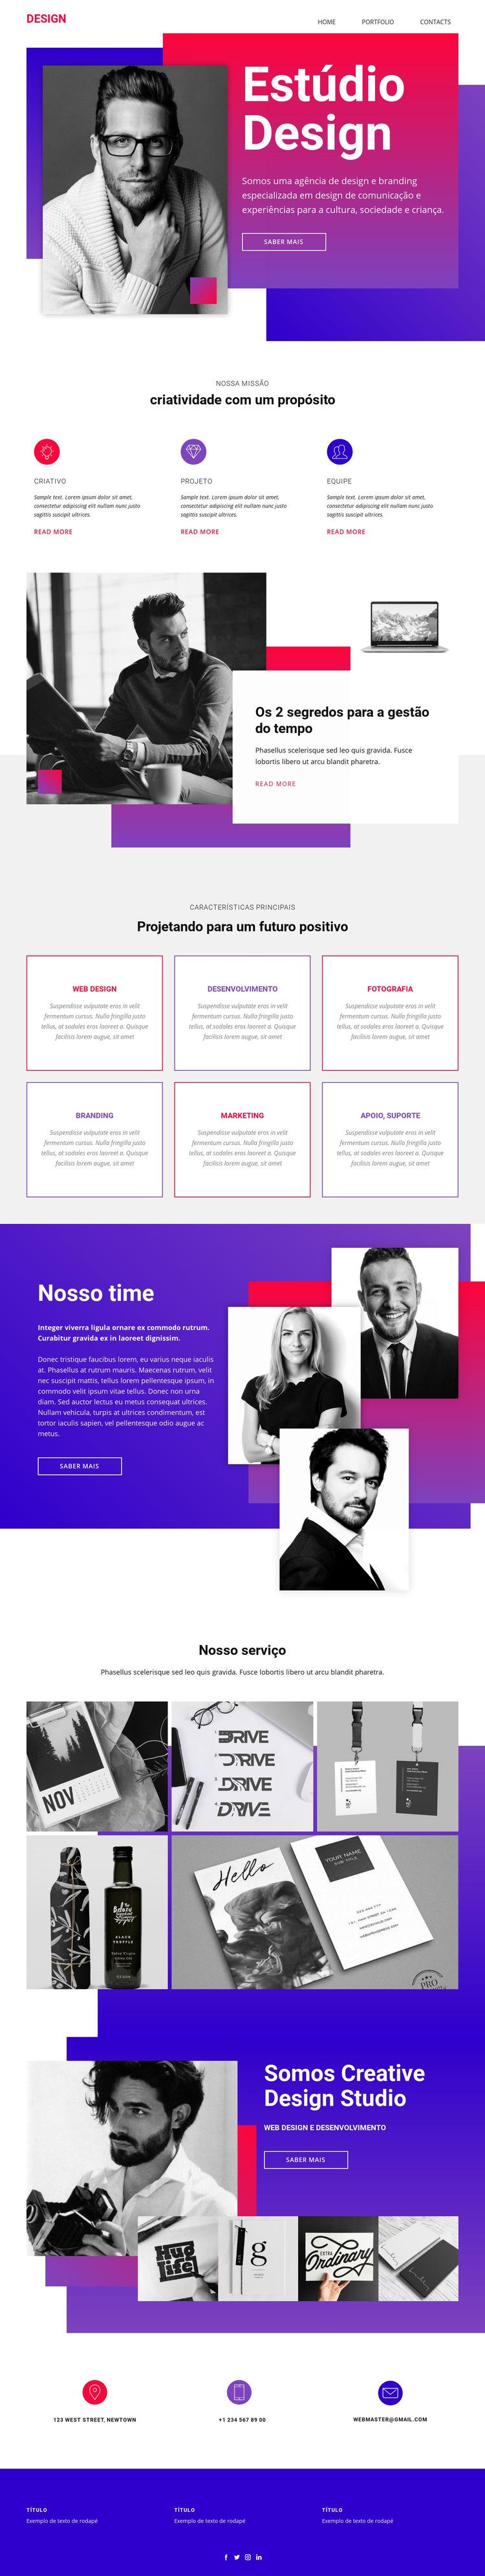 Time web design art Modelo de site